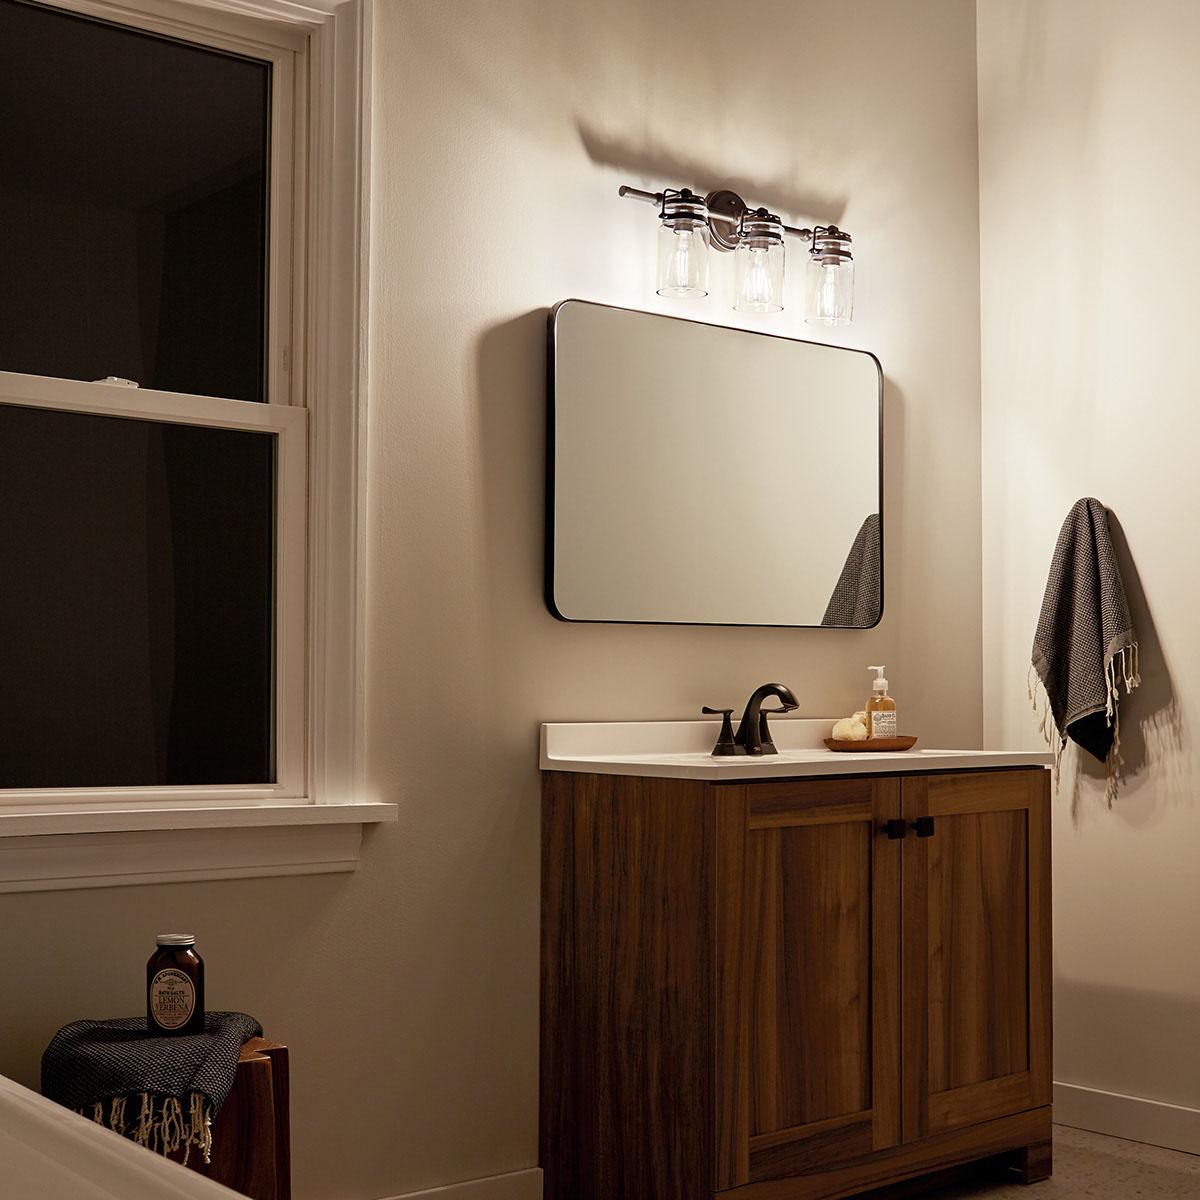 Brinley 3 Light Vanity Light Brushed Nickel Kichler Lighting